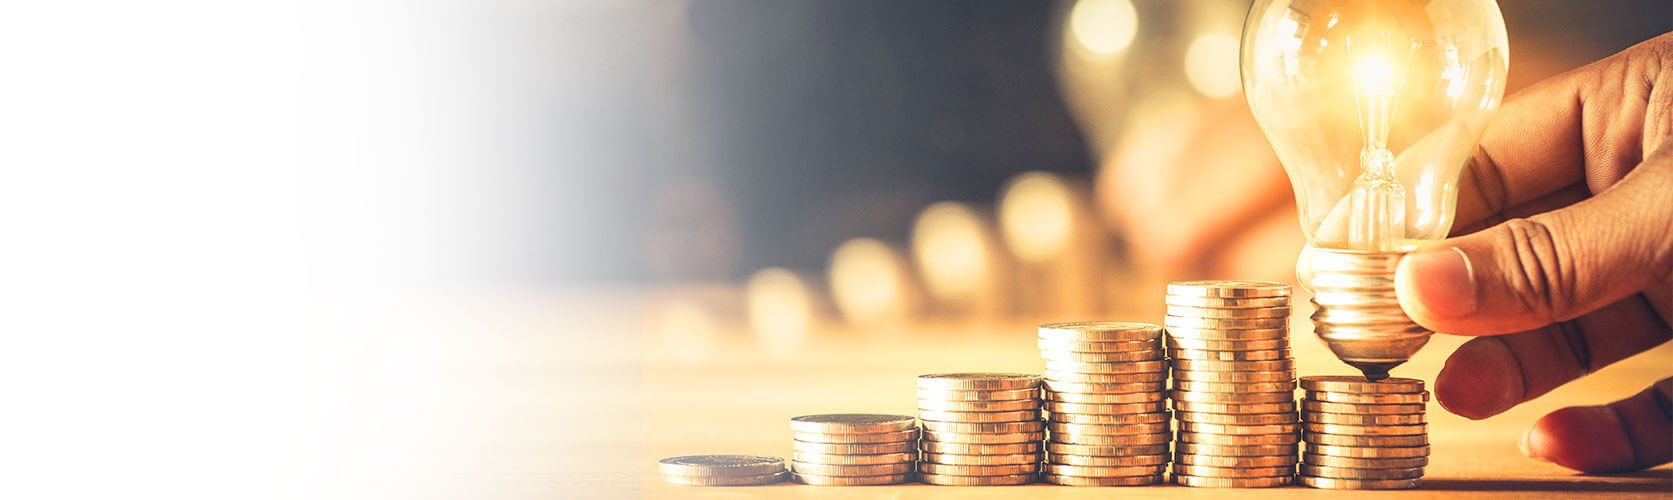 Fidelity-Bank-Investor-relation